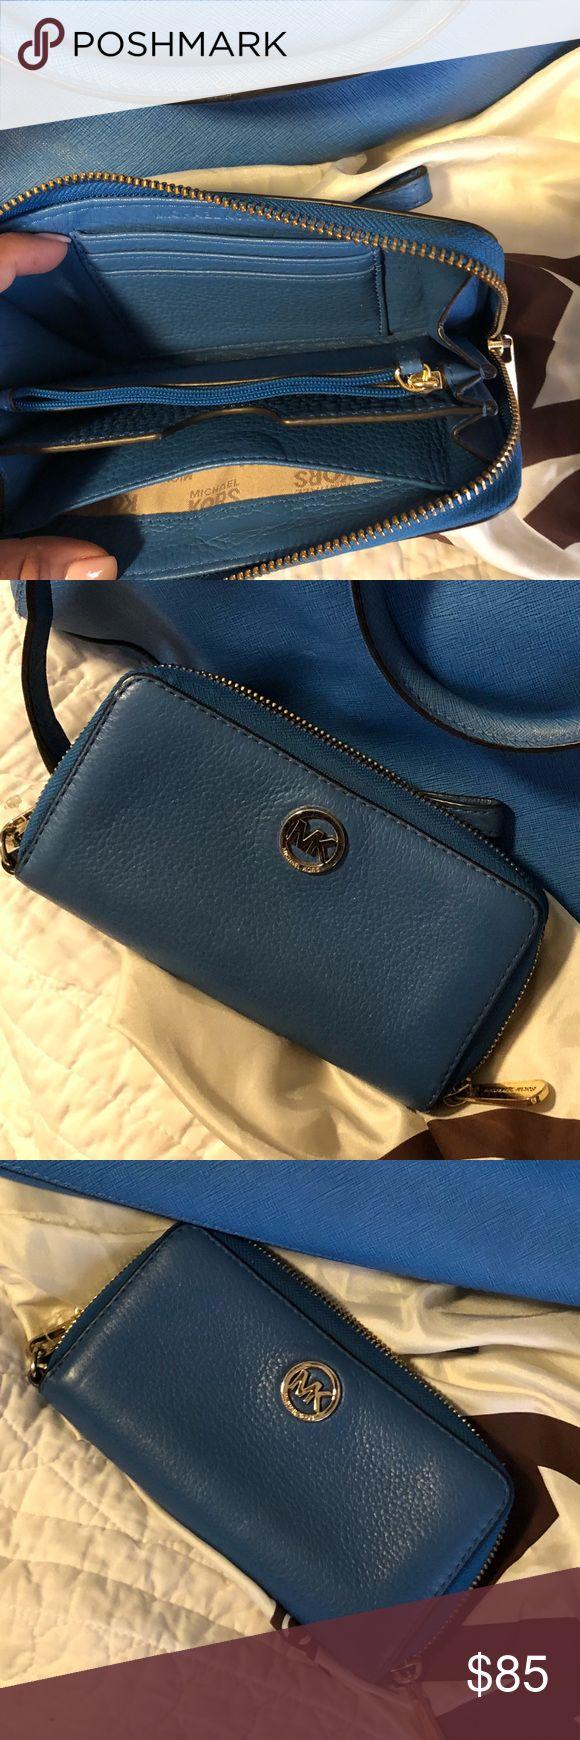 Michael KORS blue wristlet Soft leather wallet wristlet. In great condition!! Michael Kors Bags Clutches & Wristlets